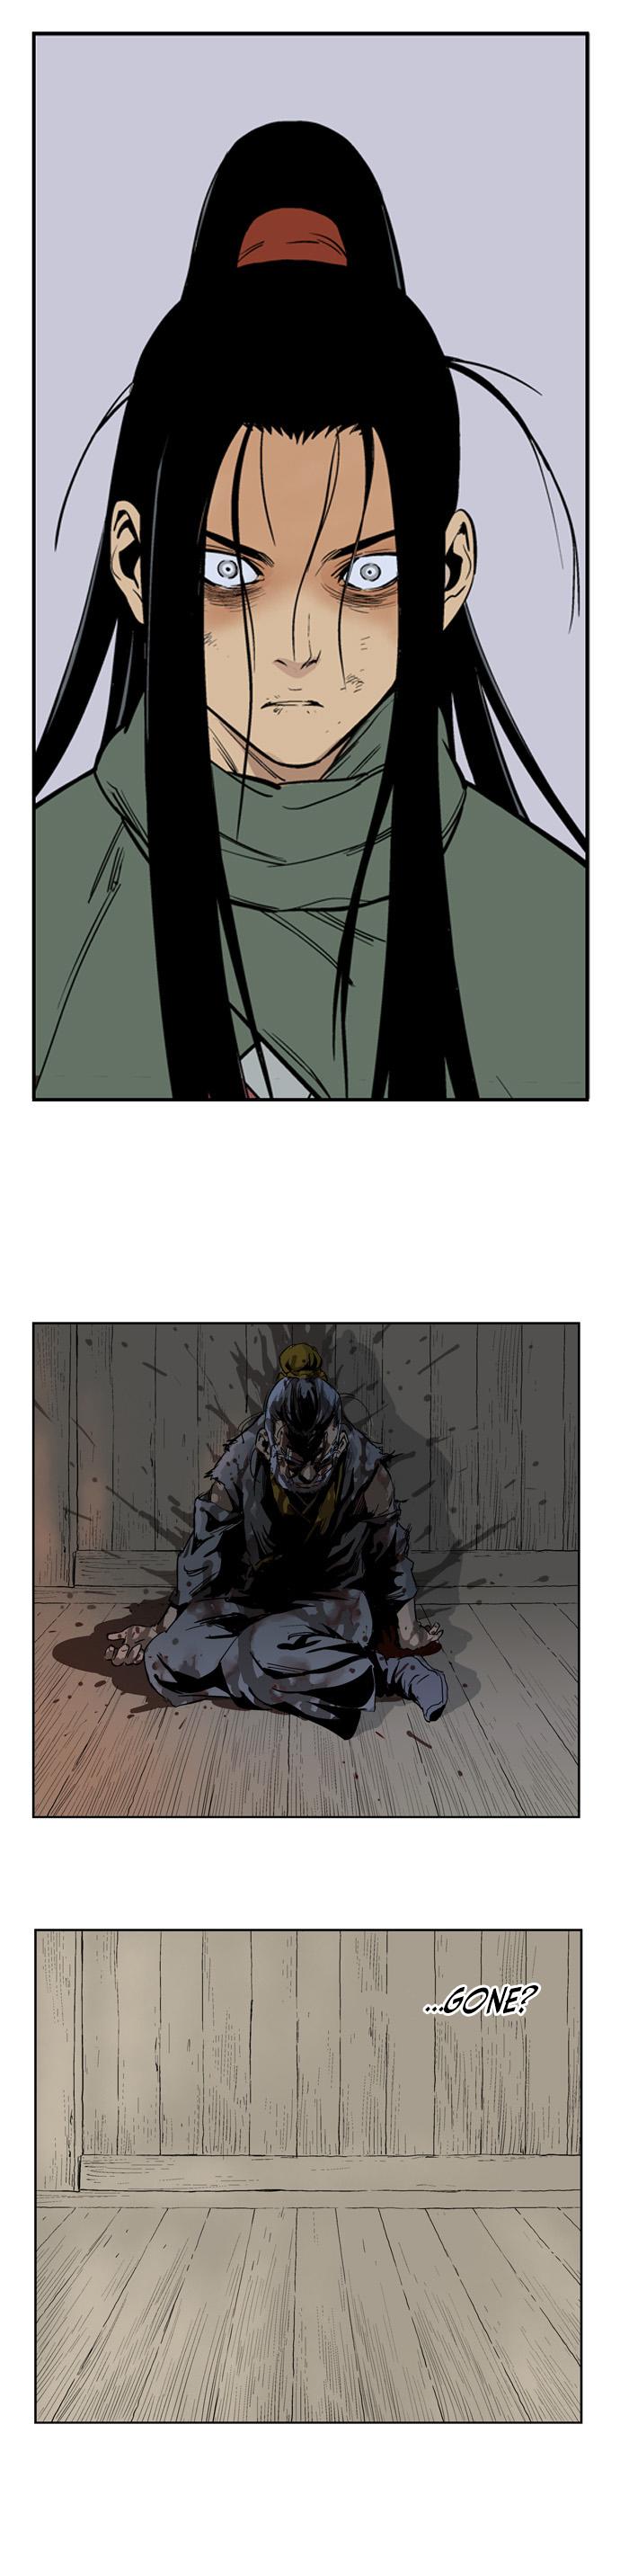 Gosu (The Master) - Chapter 17